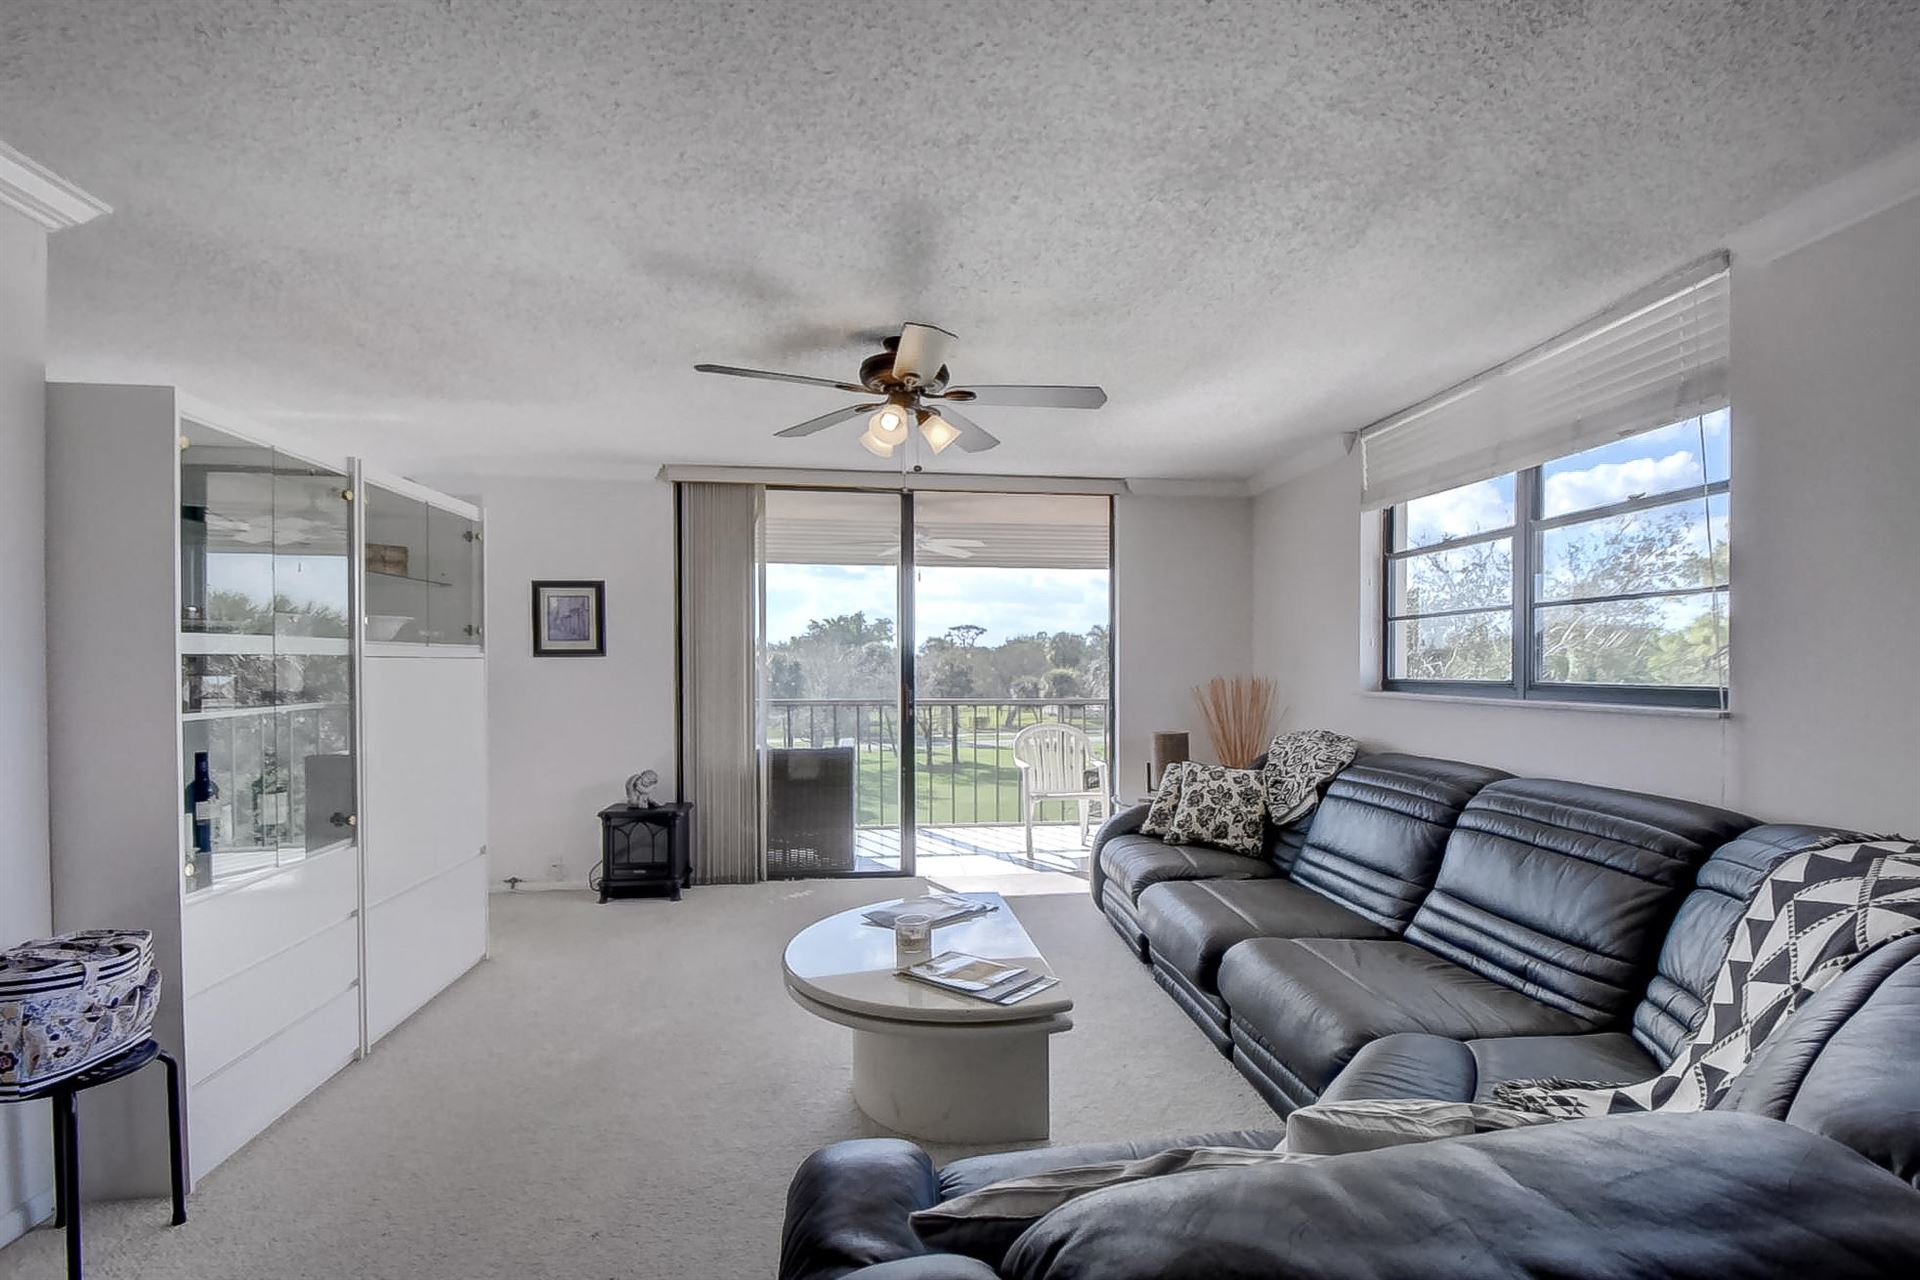 2440 Dc Country Club Boulevard #401c, Deerfield Beach, FL 33442 - #: RX-10688213